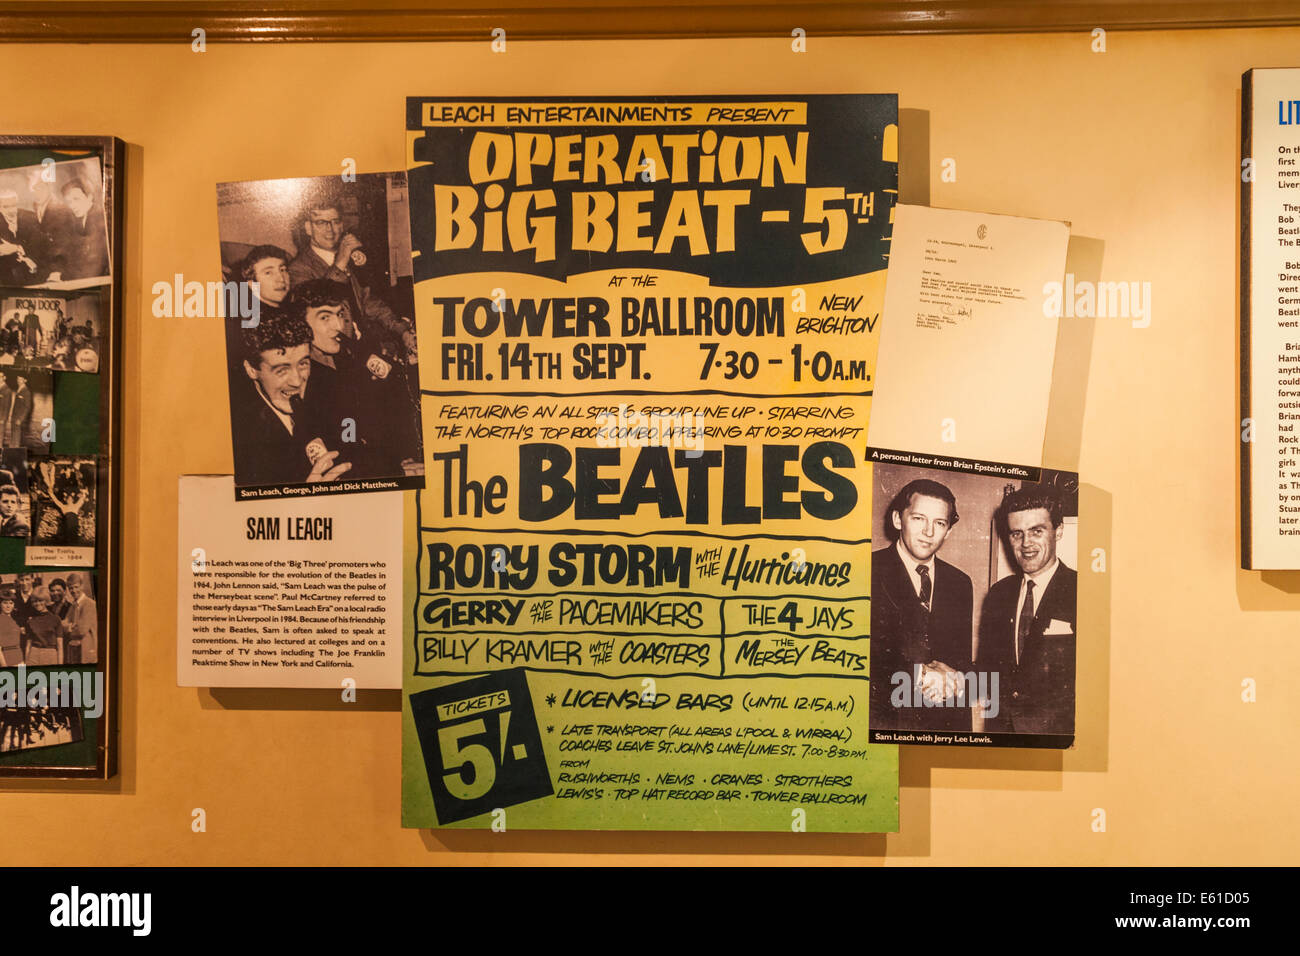 Pop Music Poster Stockfotos & Pop Music Poster Bilder - Alamy